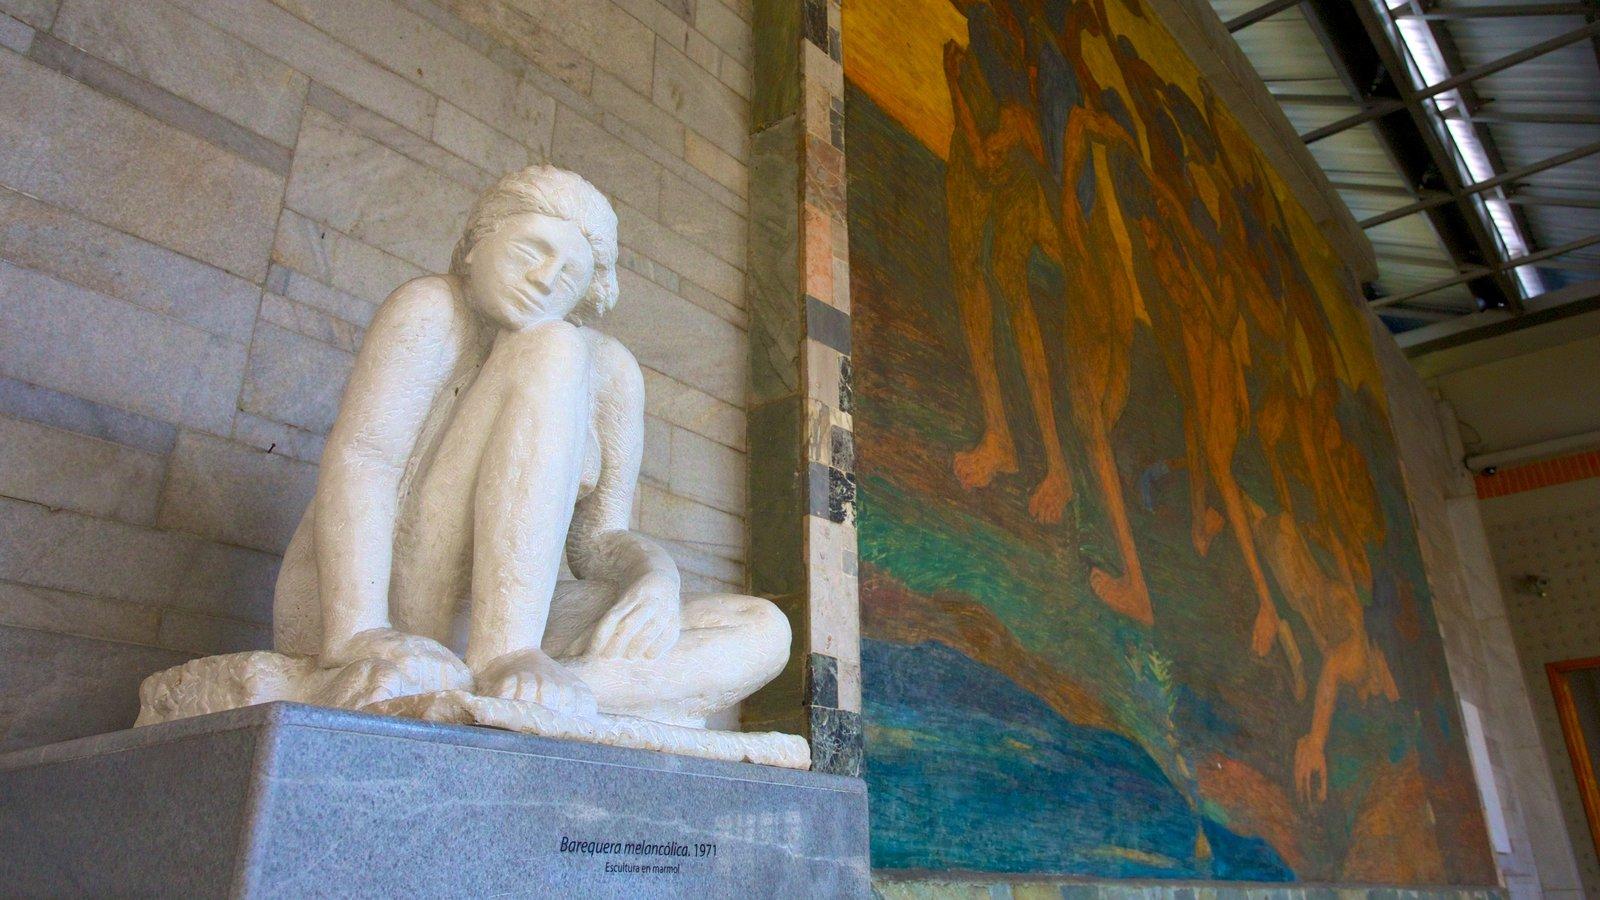 Fundación Casa Museo Maestro Pedro Nel Gómez que inclui uma estátua ou escultura, arte e vistas internas